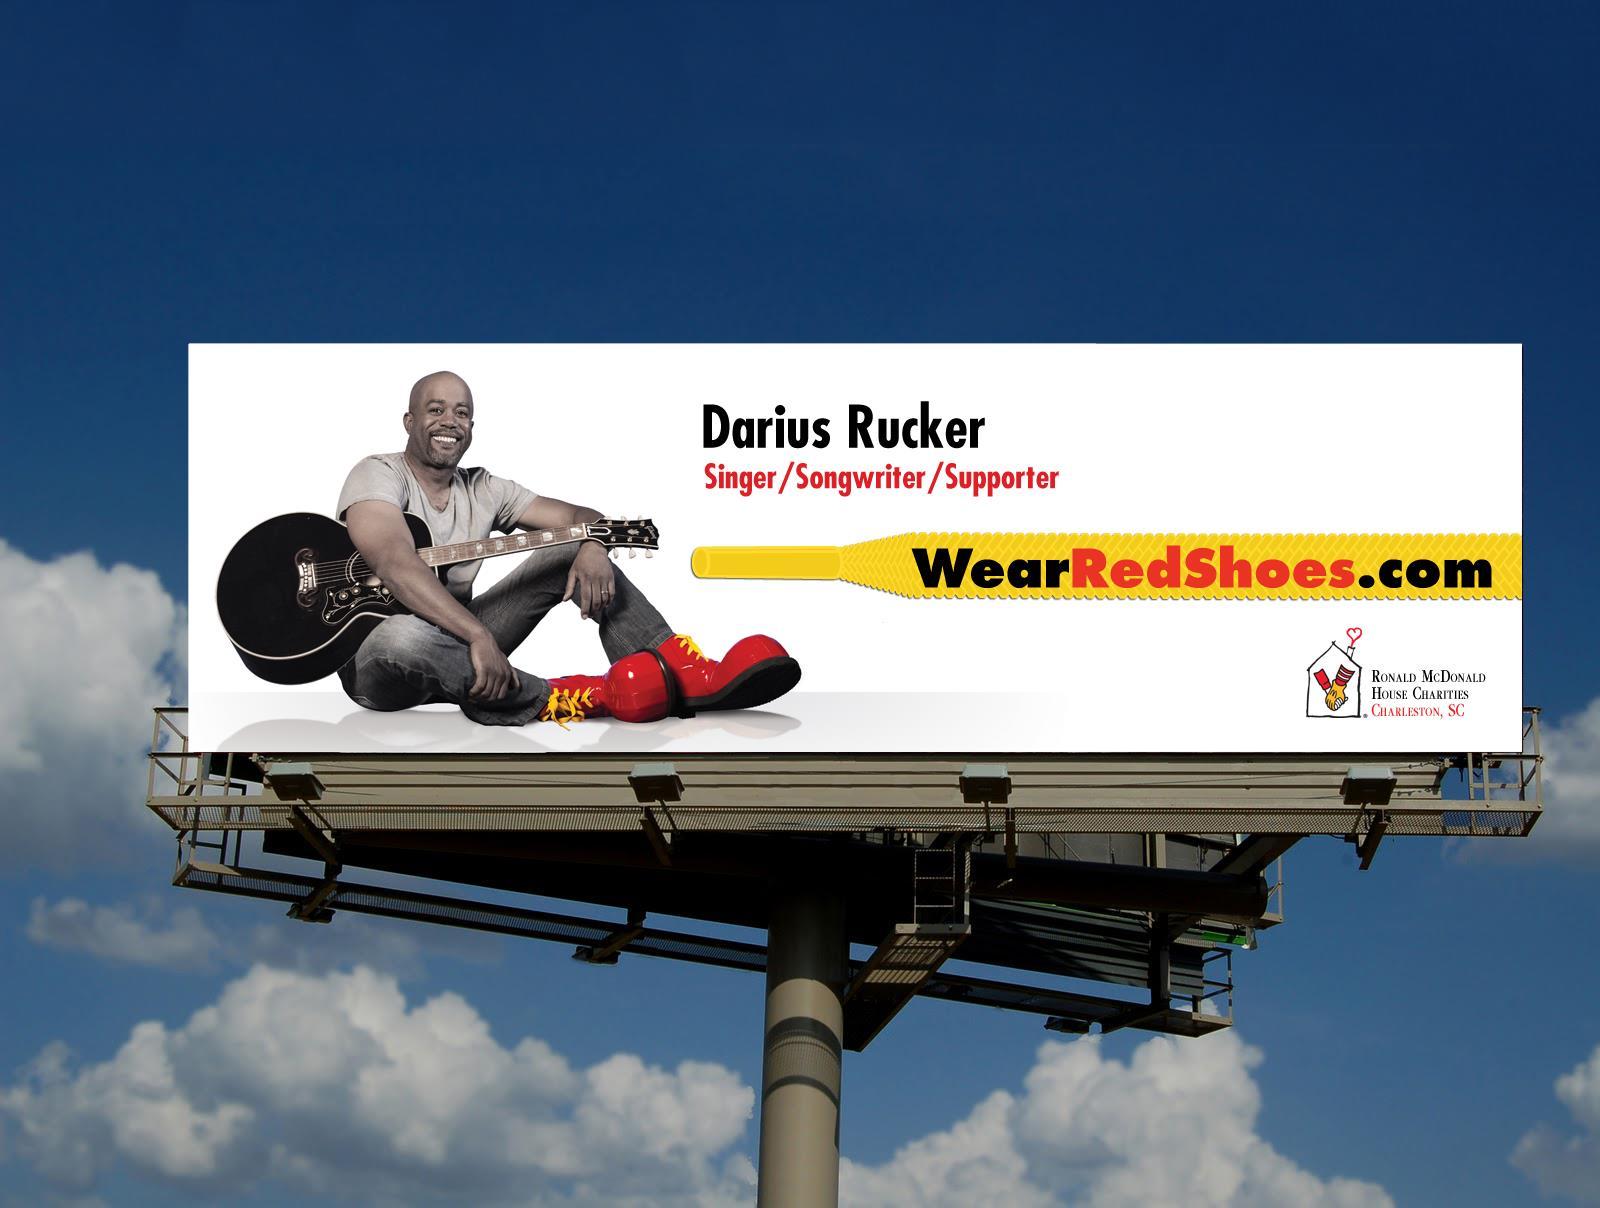 Darius Rucker Billboard on I-26